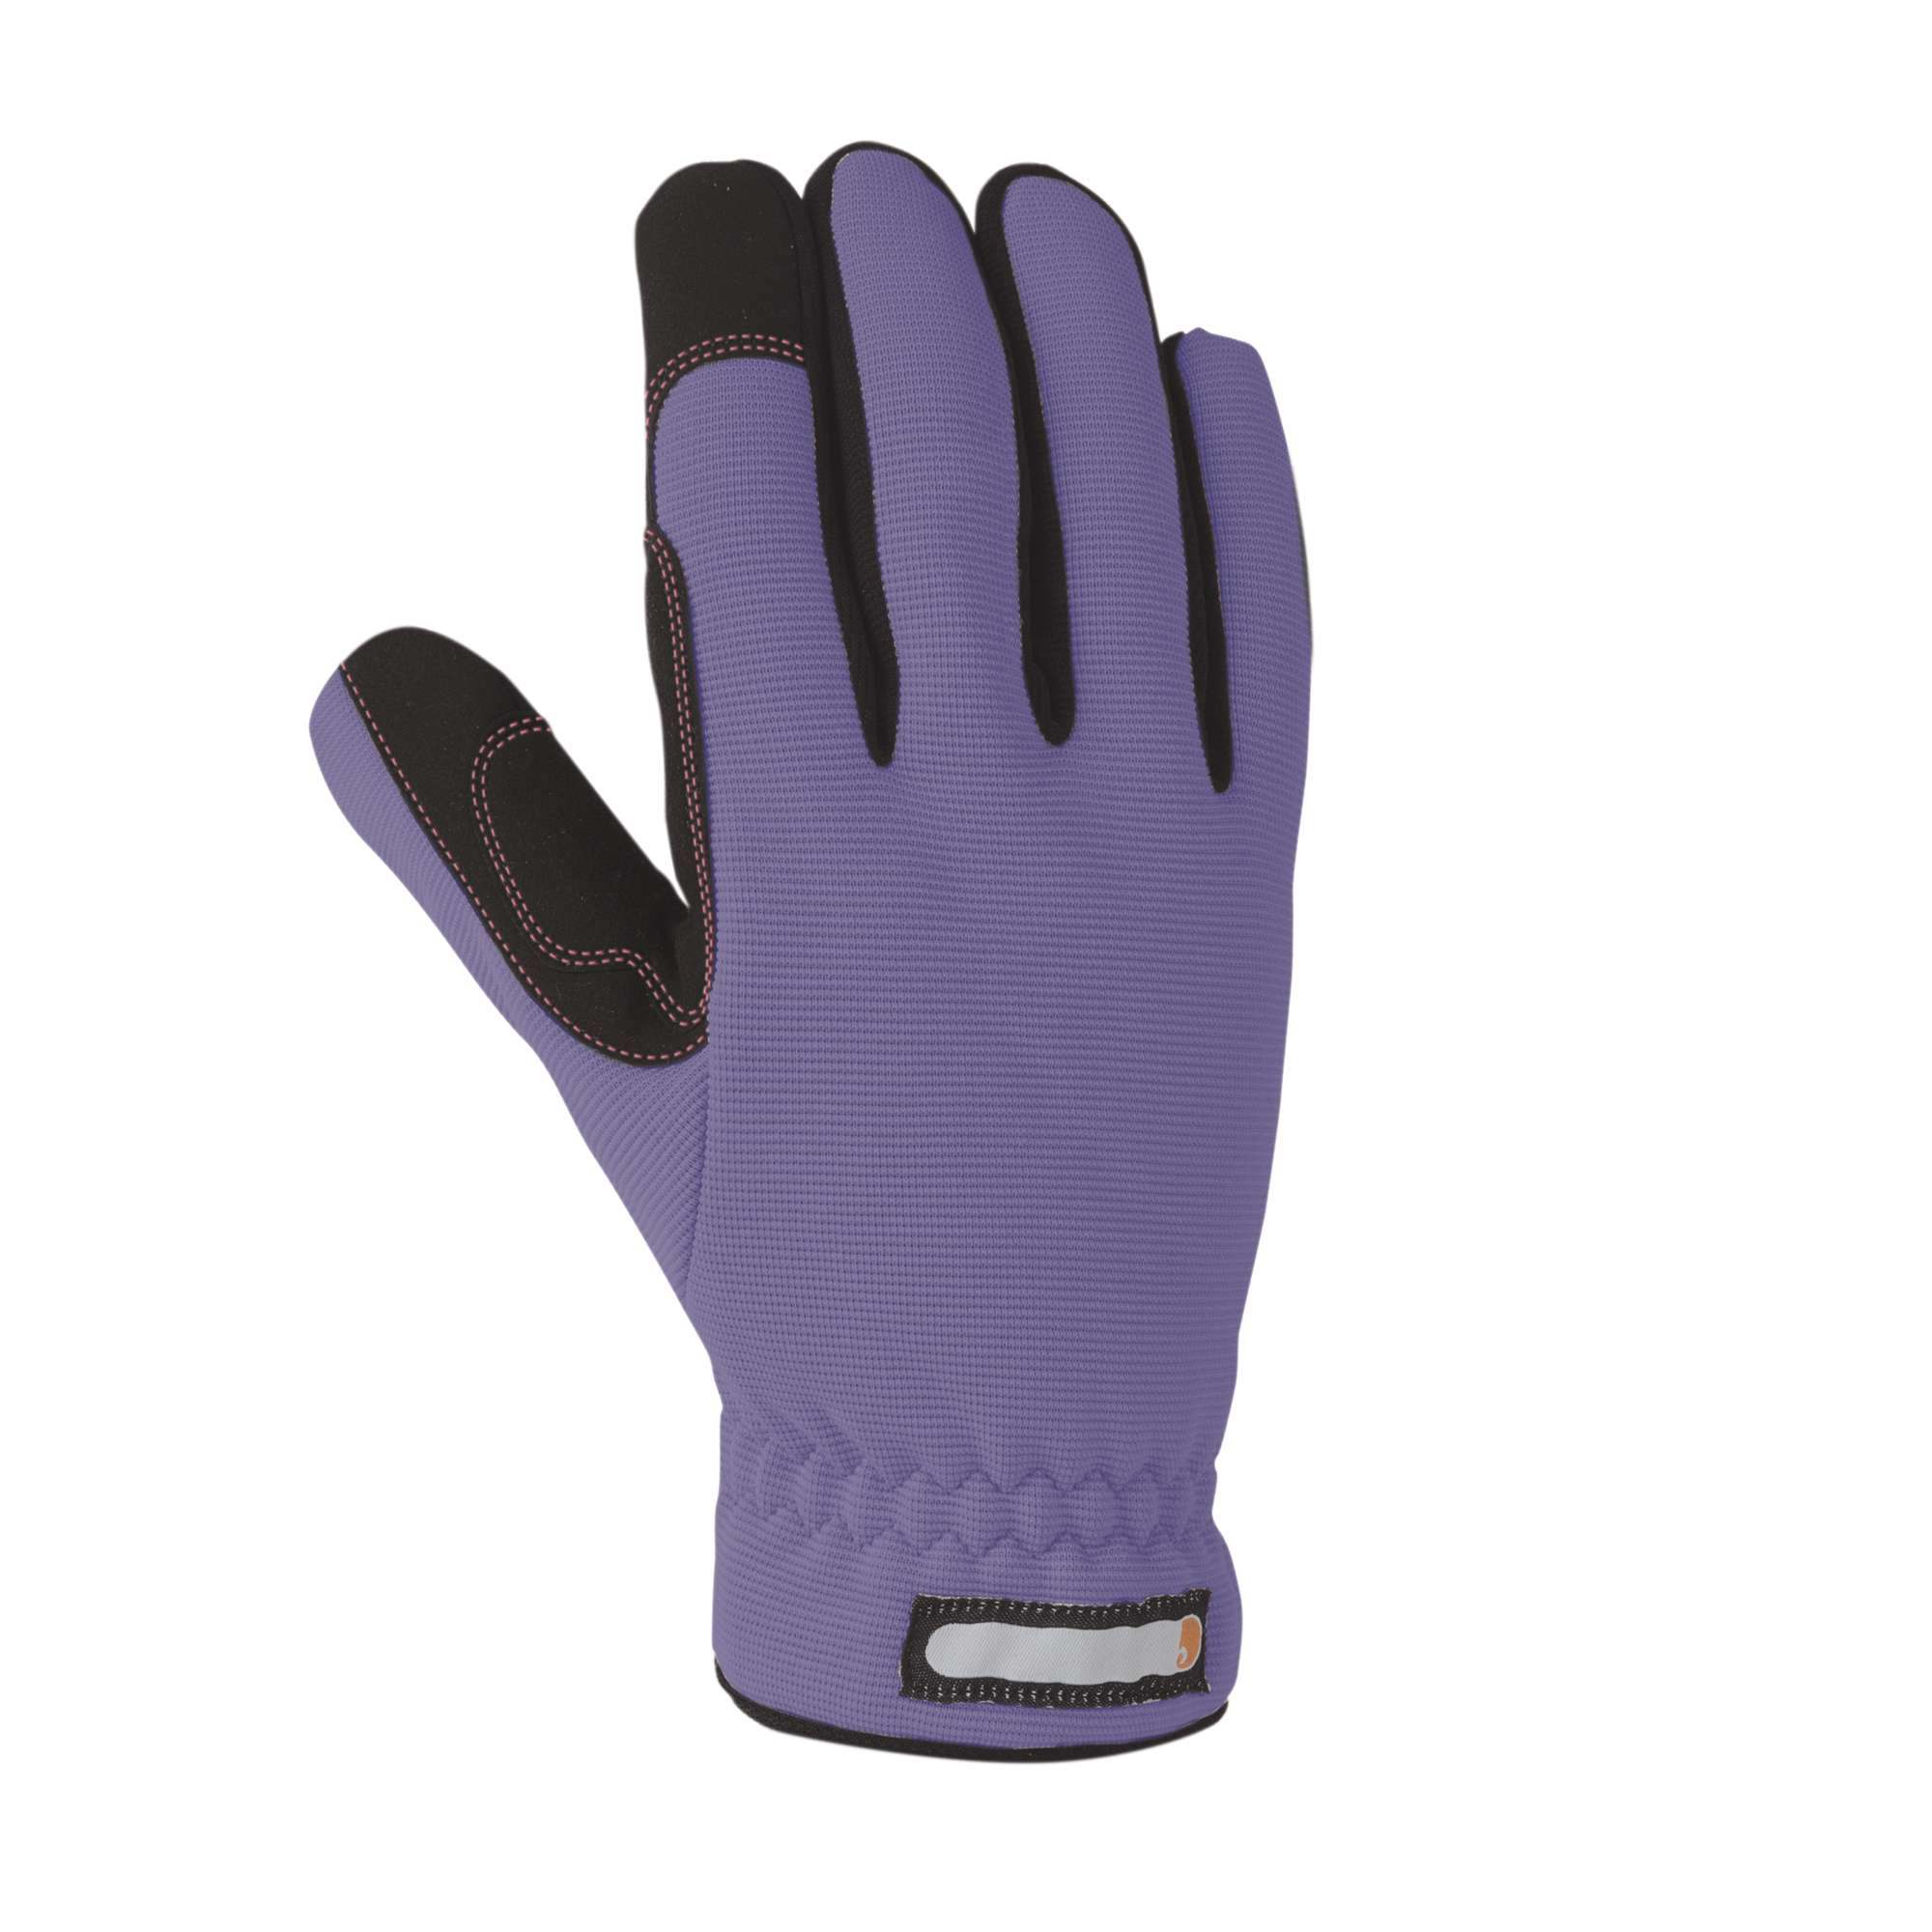 Carhartt Work Flex Glove